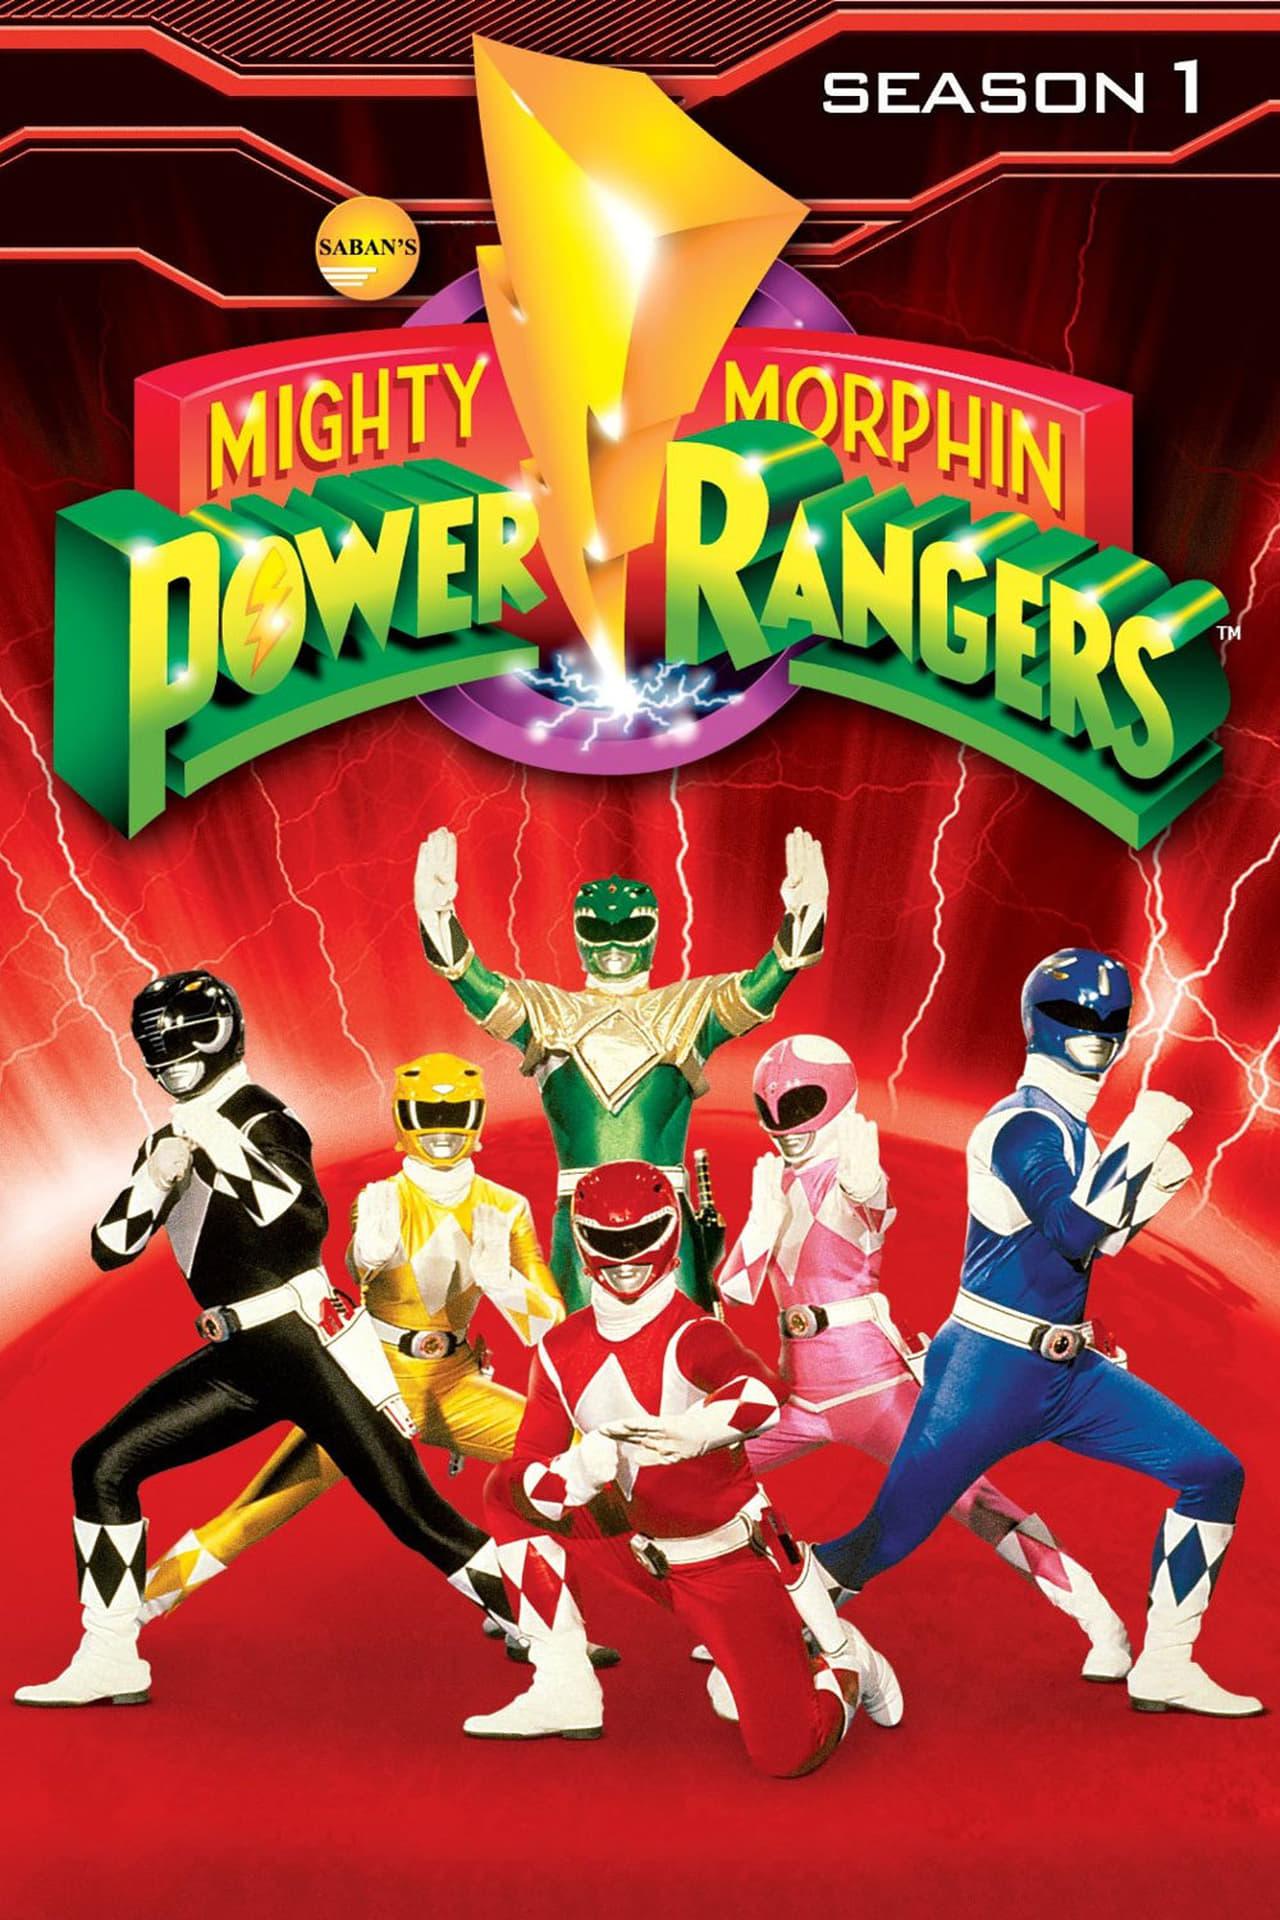 Power Rangers Season 1 (1993) putlockers cafe